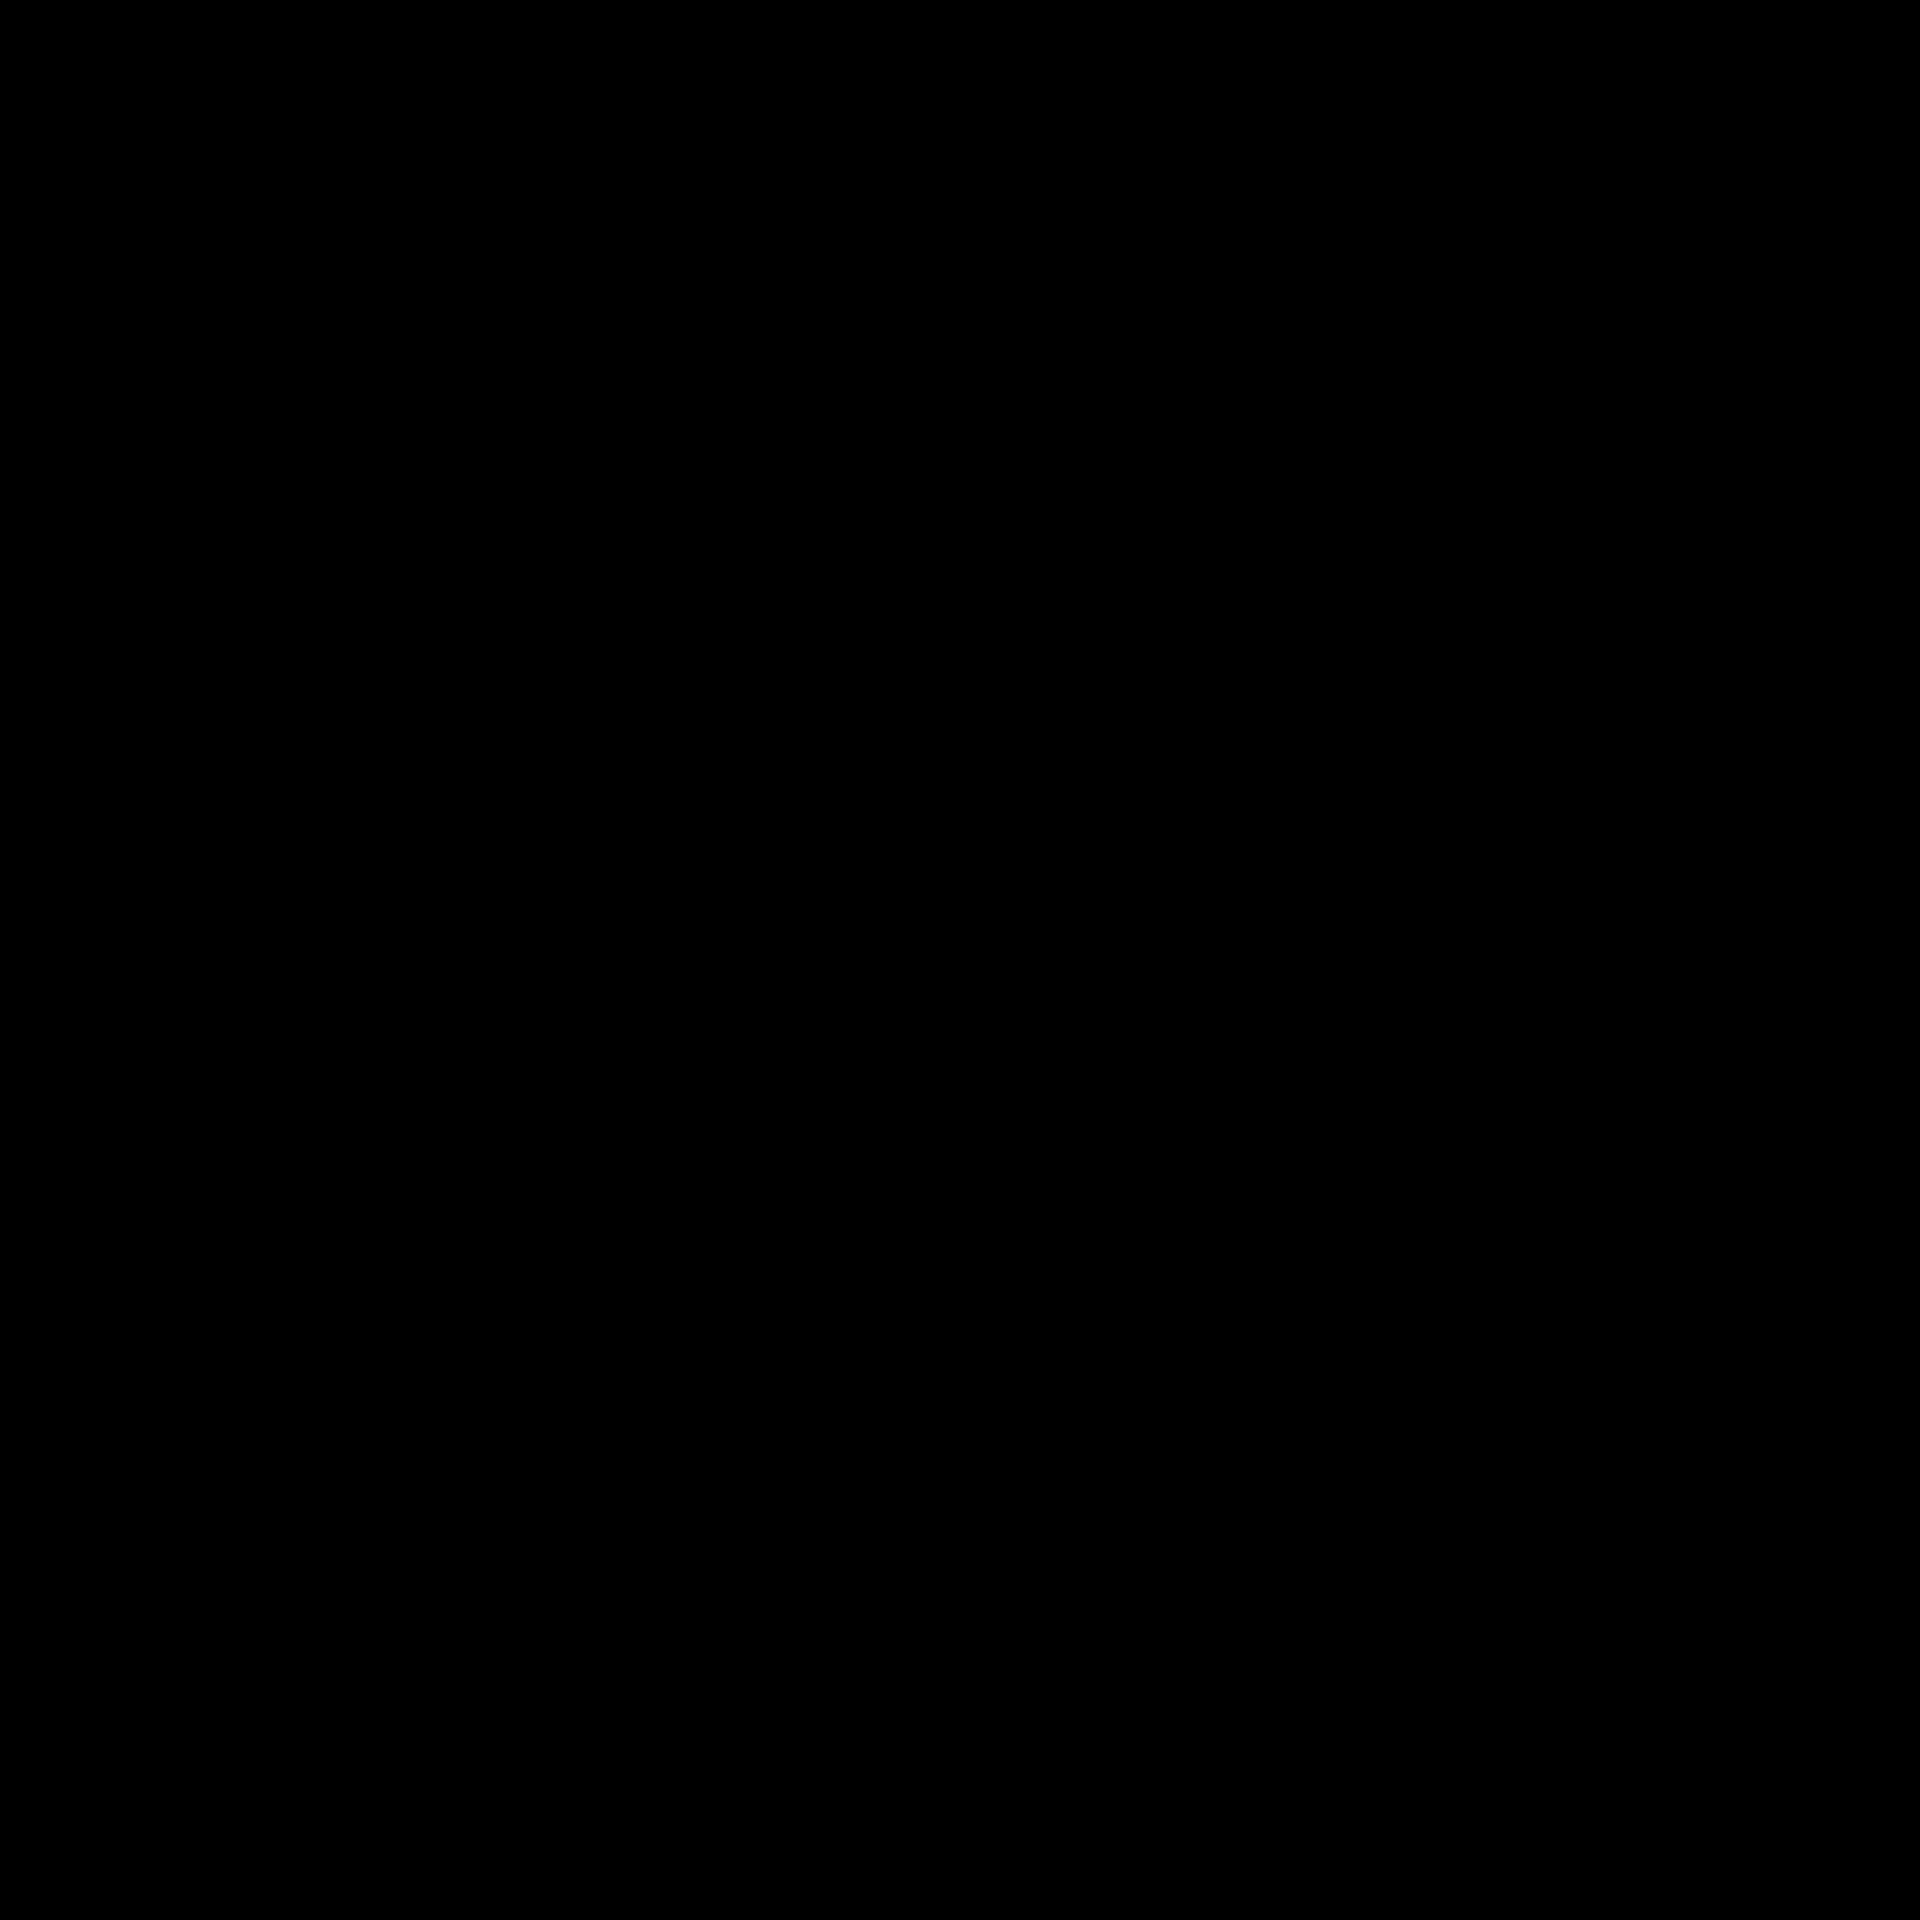 PECORAARGENTINA